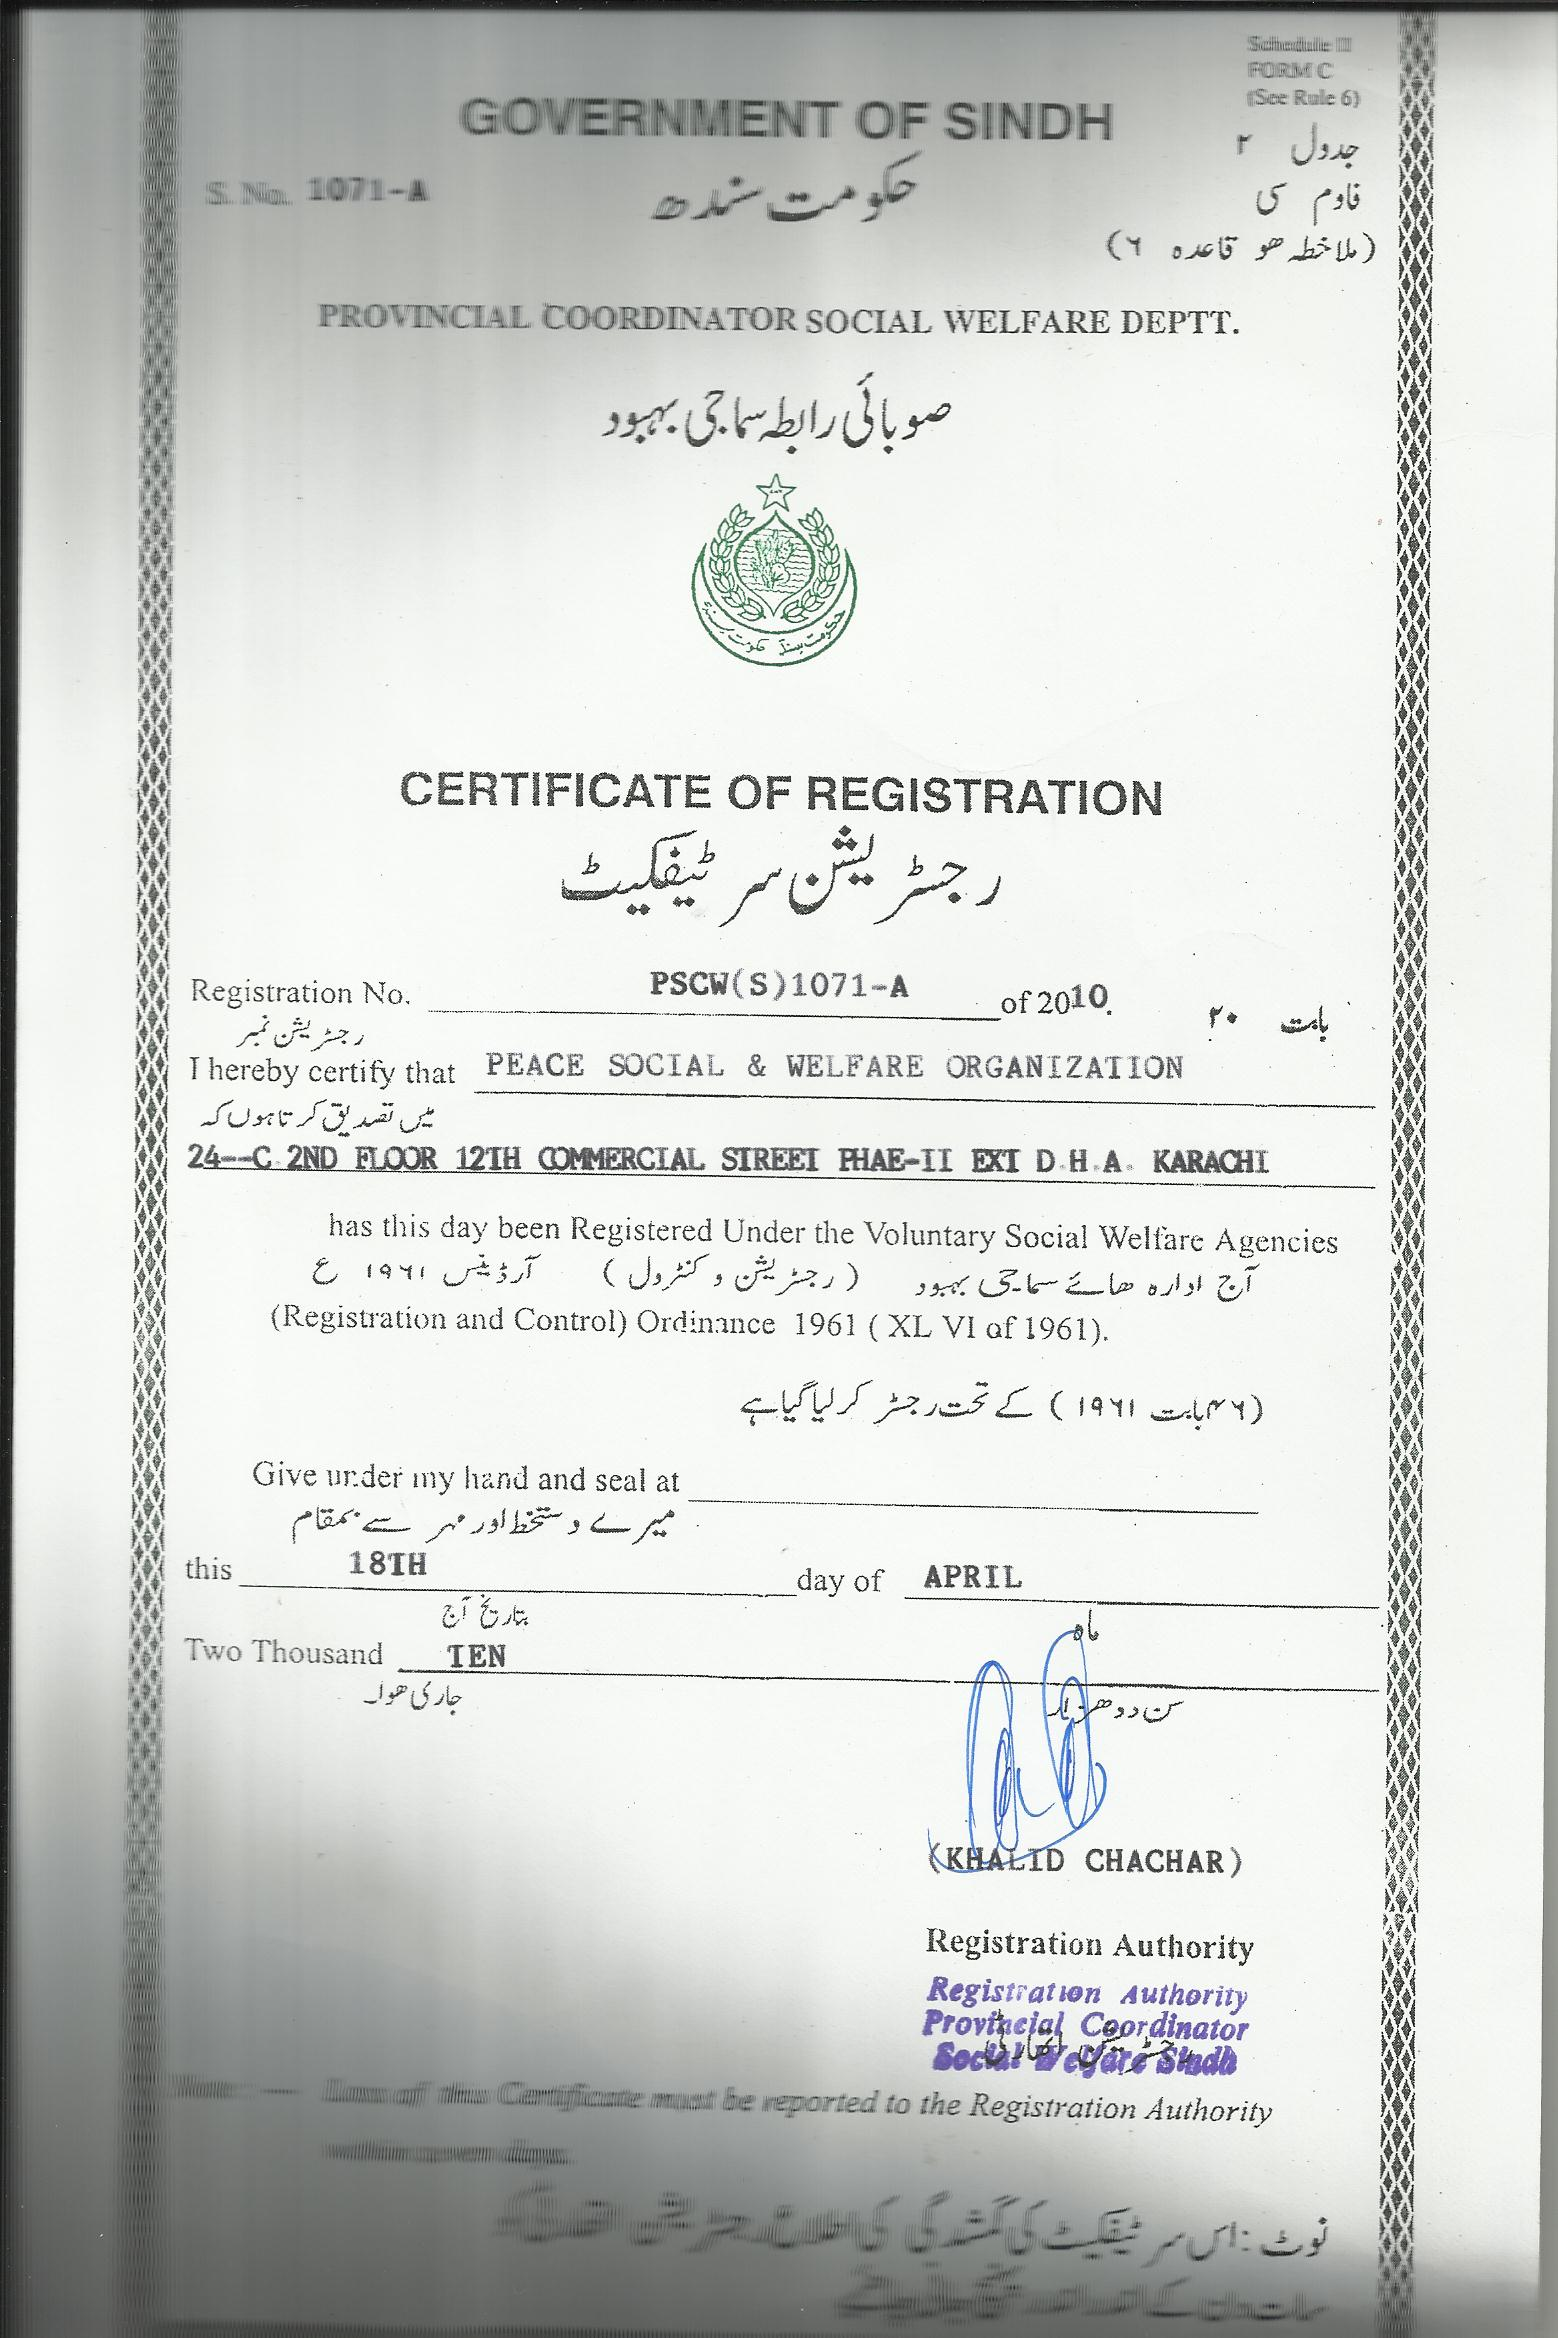 NGO Registration - Blue Chip International